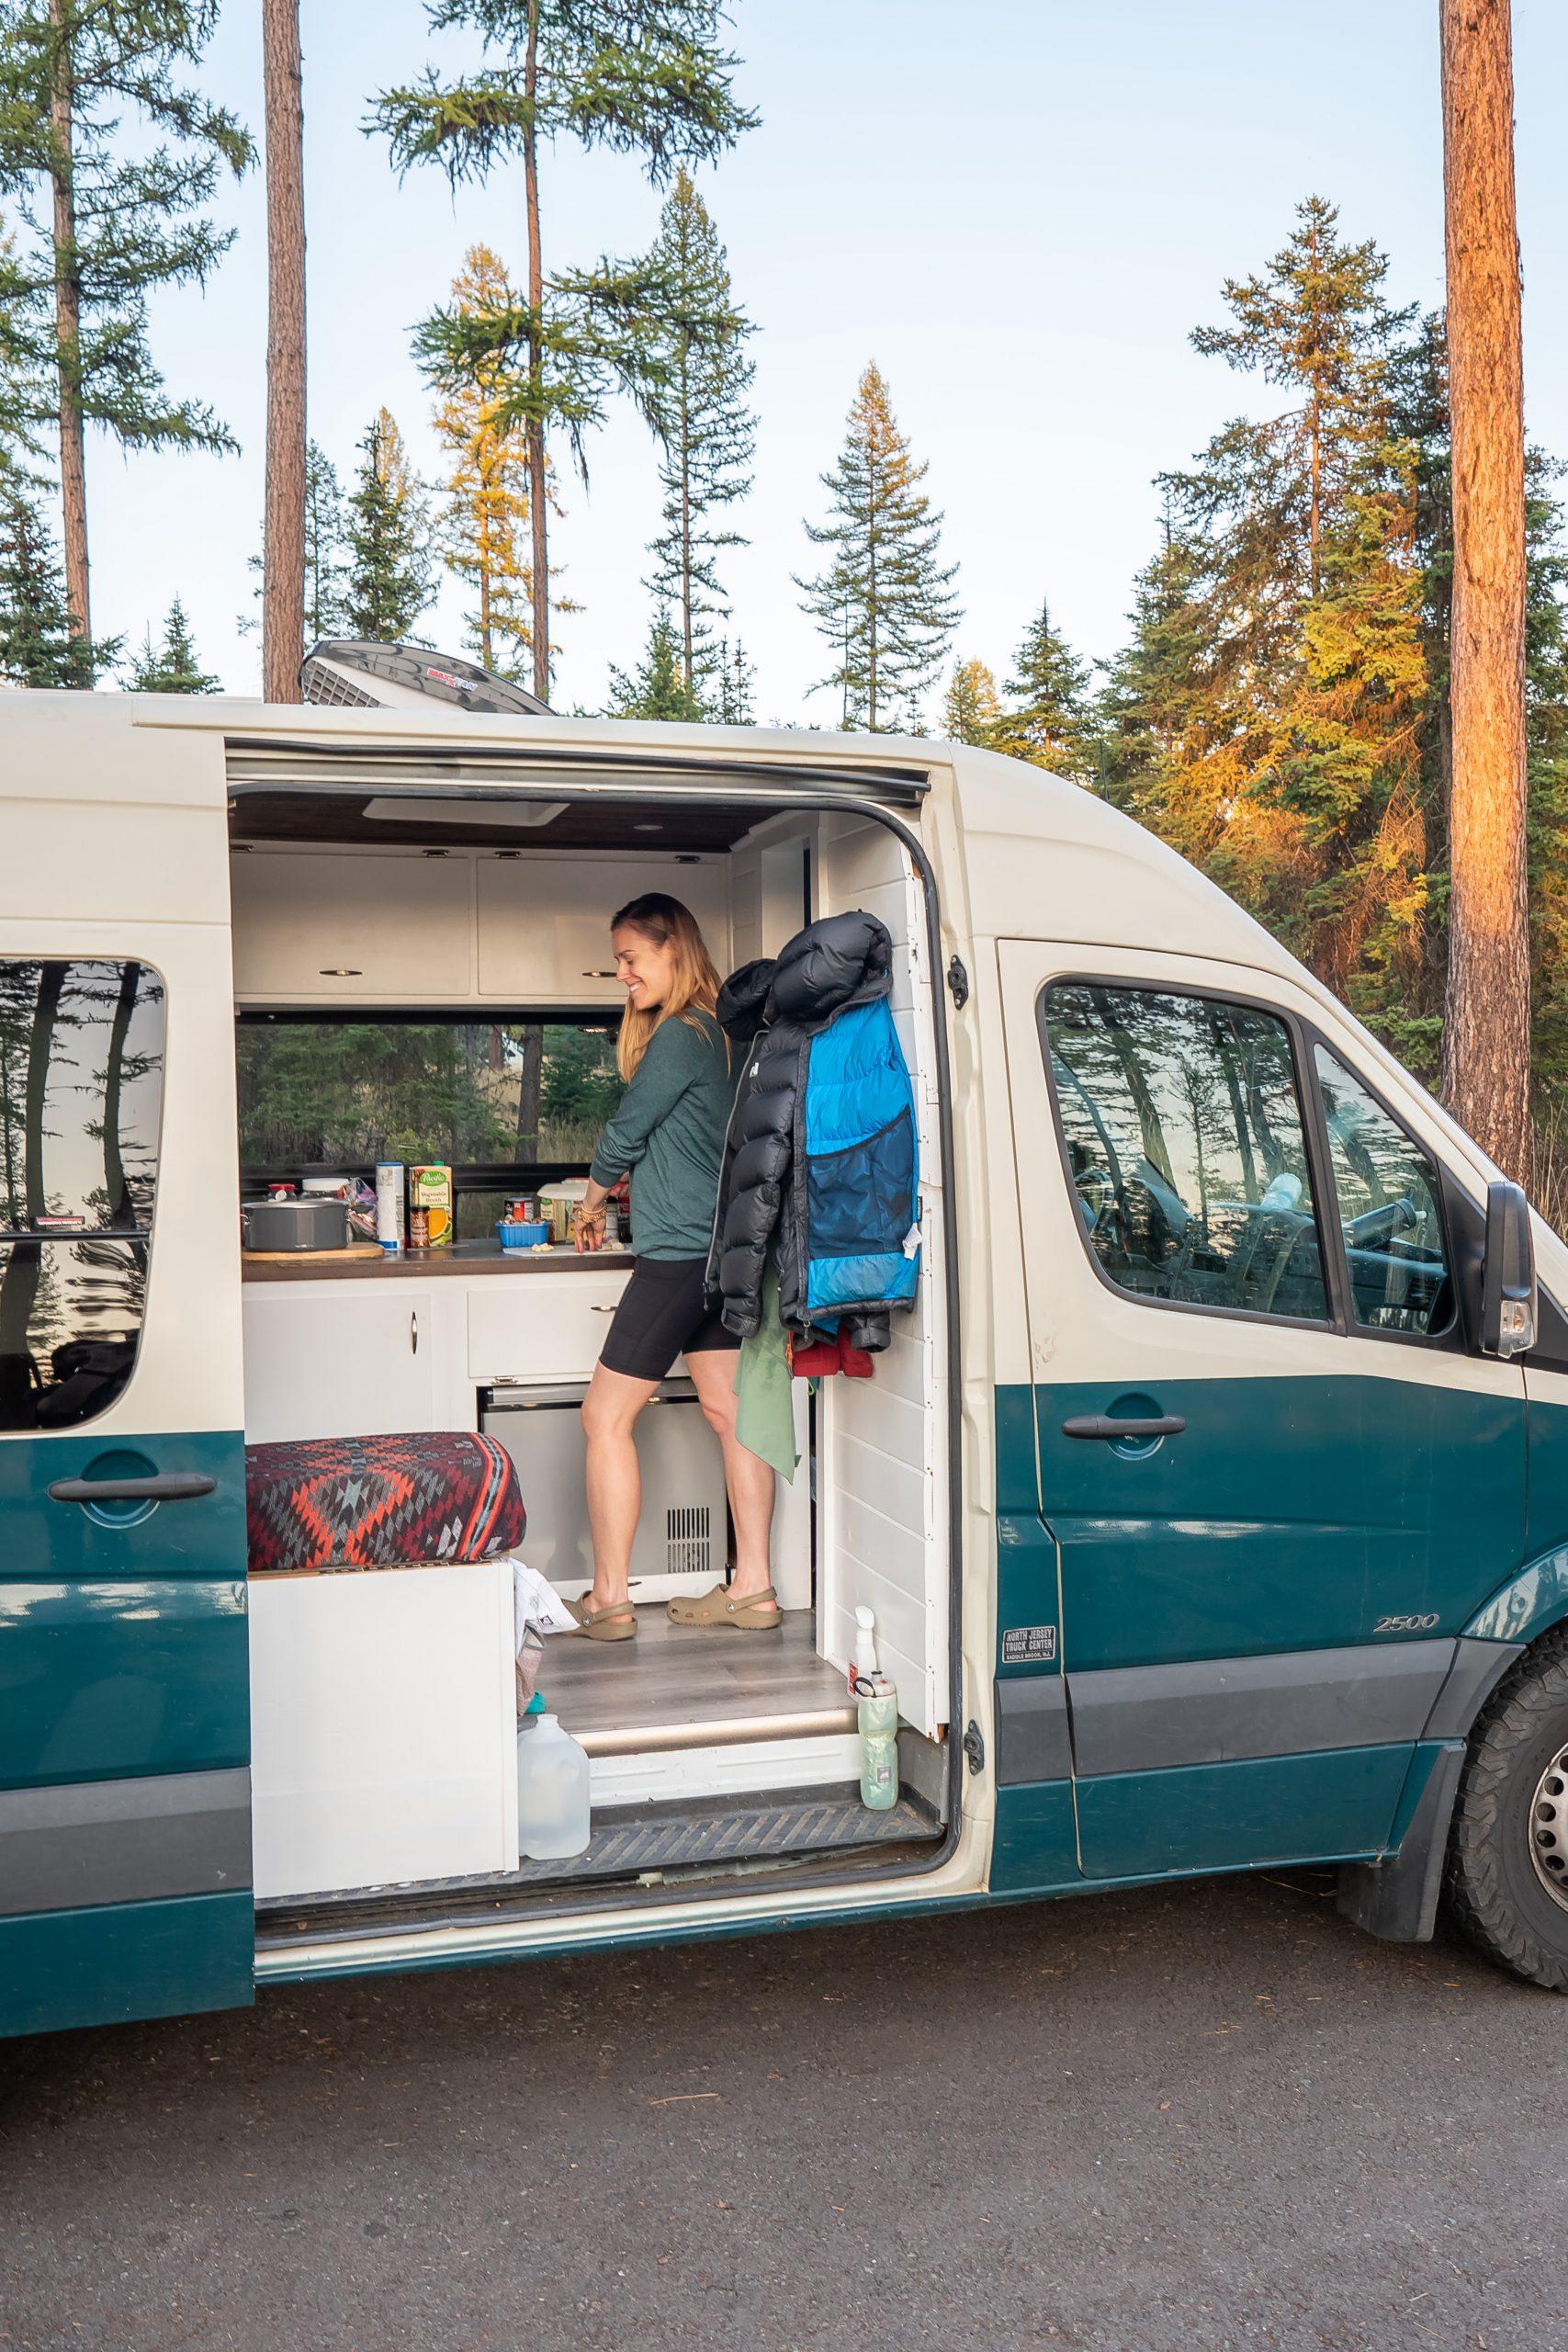 Using my van life kitchen essentials in a Montana campsite